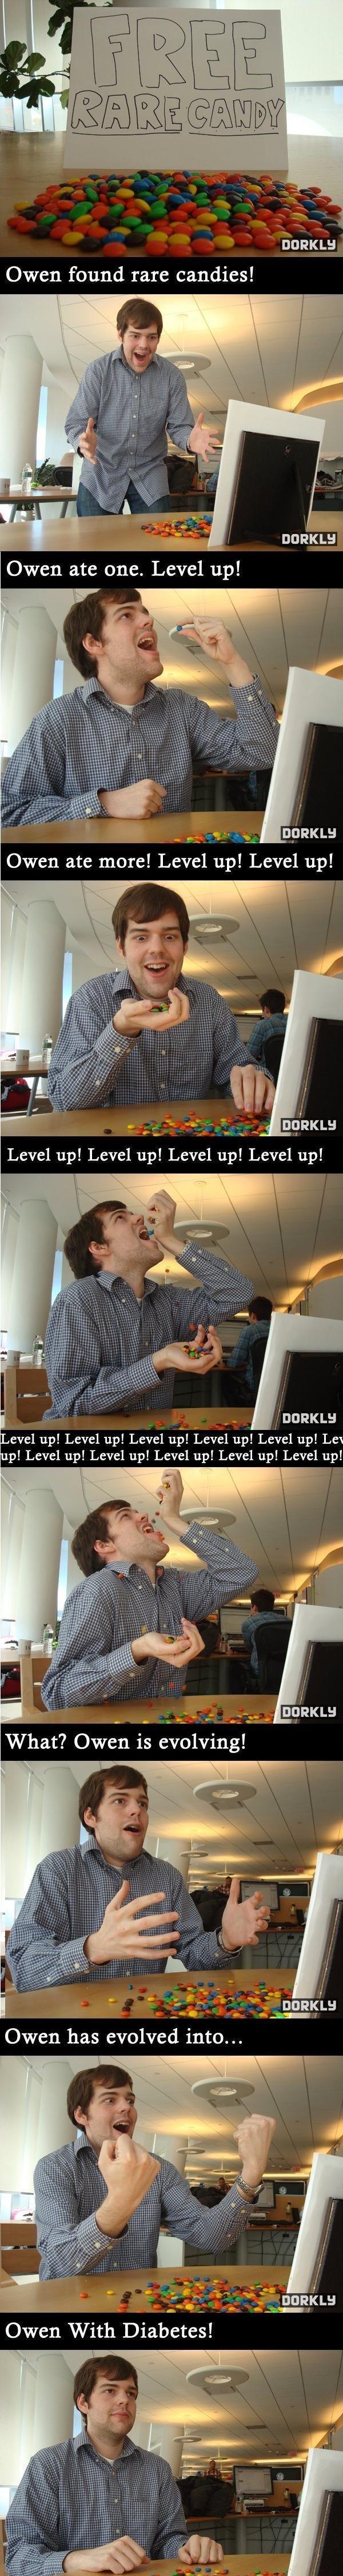 "Rare candy problems. . DARKLY Owen found rare candies! DARYLB Owen ate more! Level up! Level up! g"" ious Level up! Level up! Level up! Level up! I evel up! Leve Rare candy problems DARKLY Owen found rare candies! DARYLB ate more! Level up! g"" ious I evel Leve"